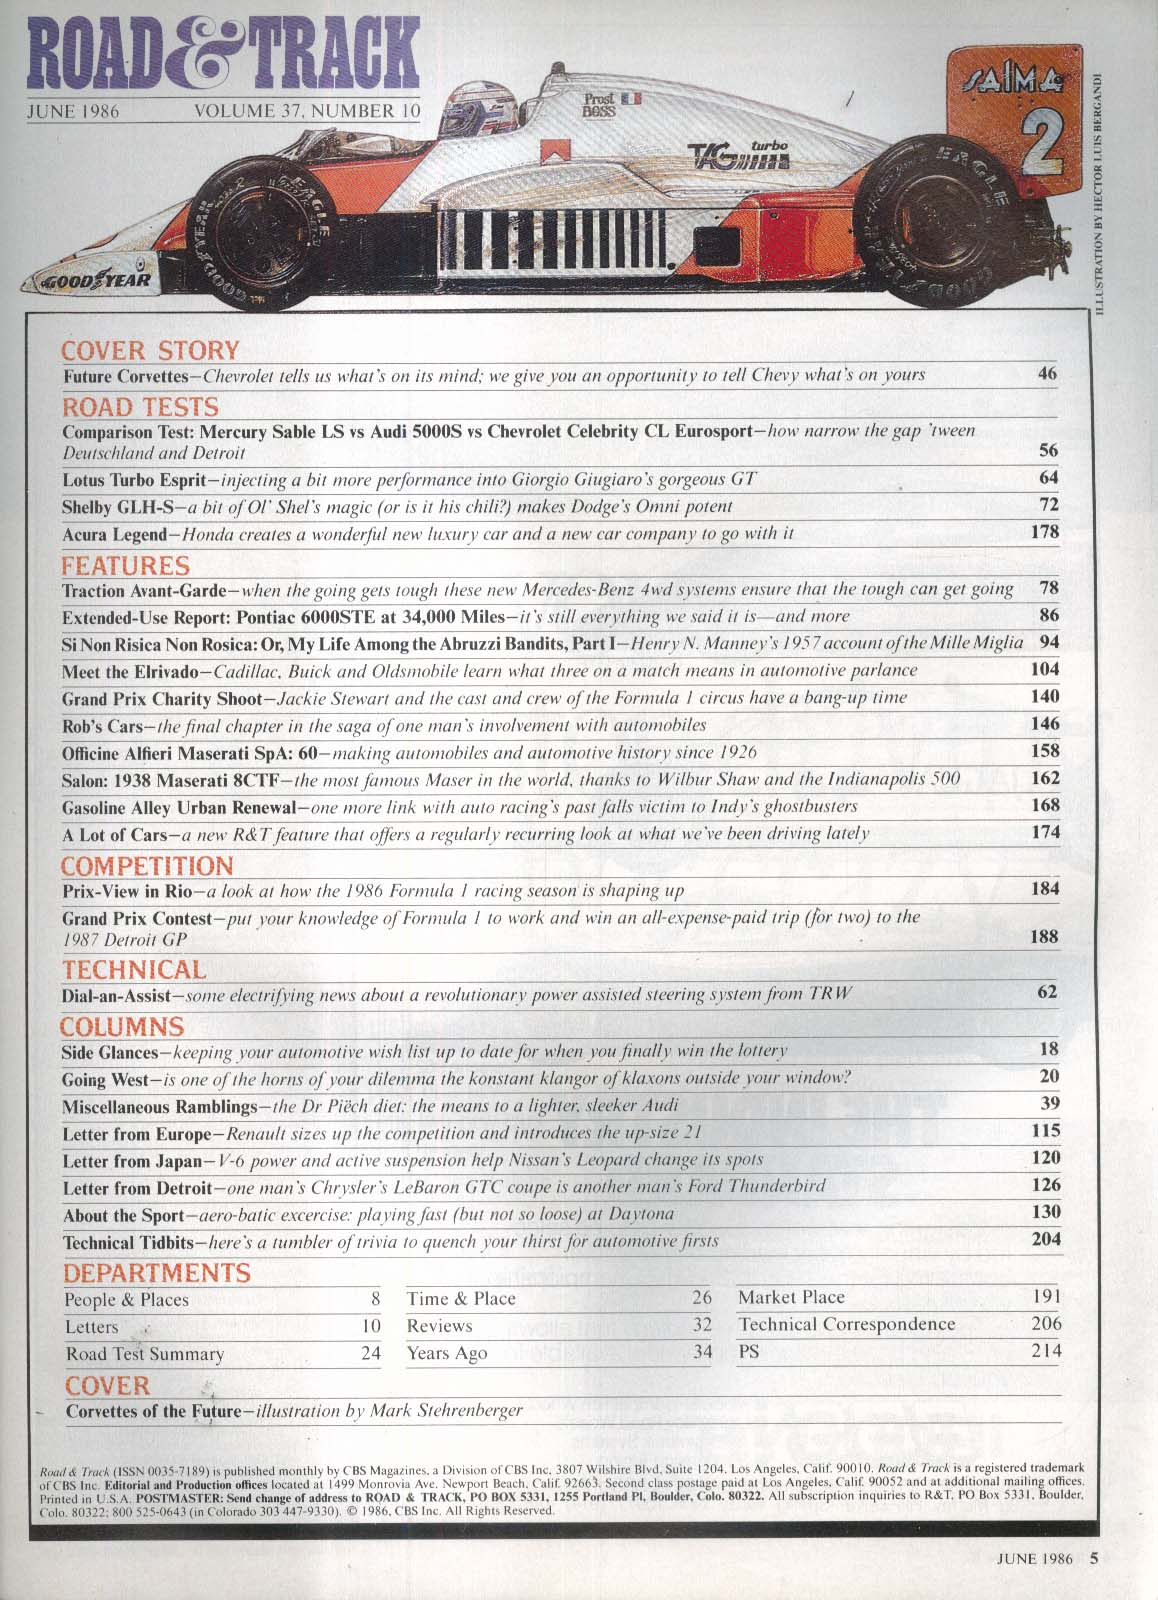 ROAD & TRACK Corvette Lotus Turbo Esprit Shelby Acura Legend road tests 6 1986